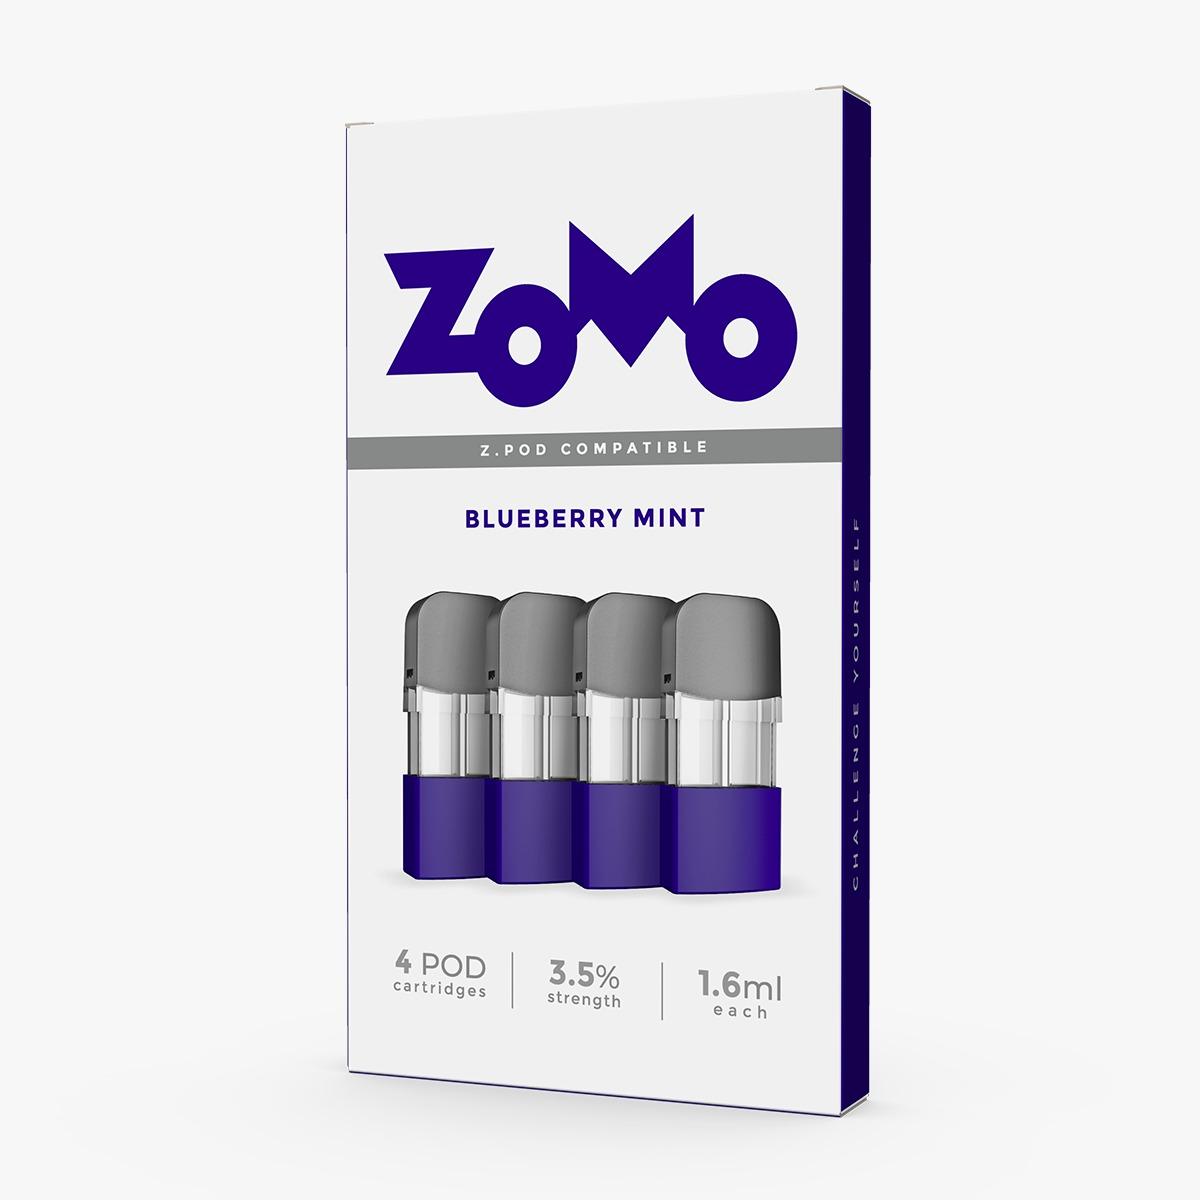 ZOMO - Zpod Blueberry Mint